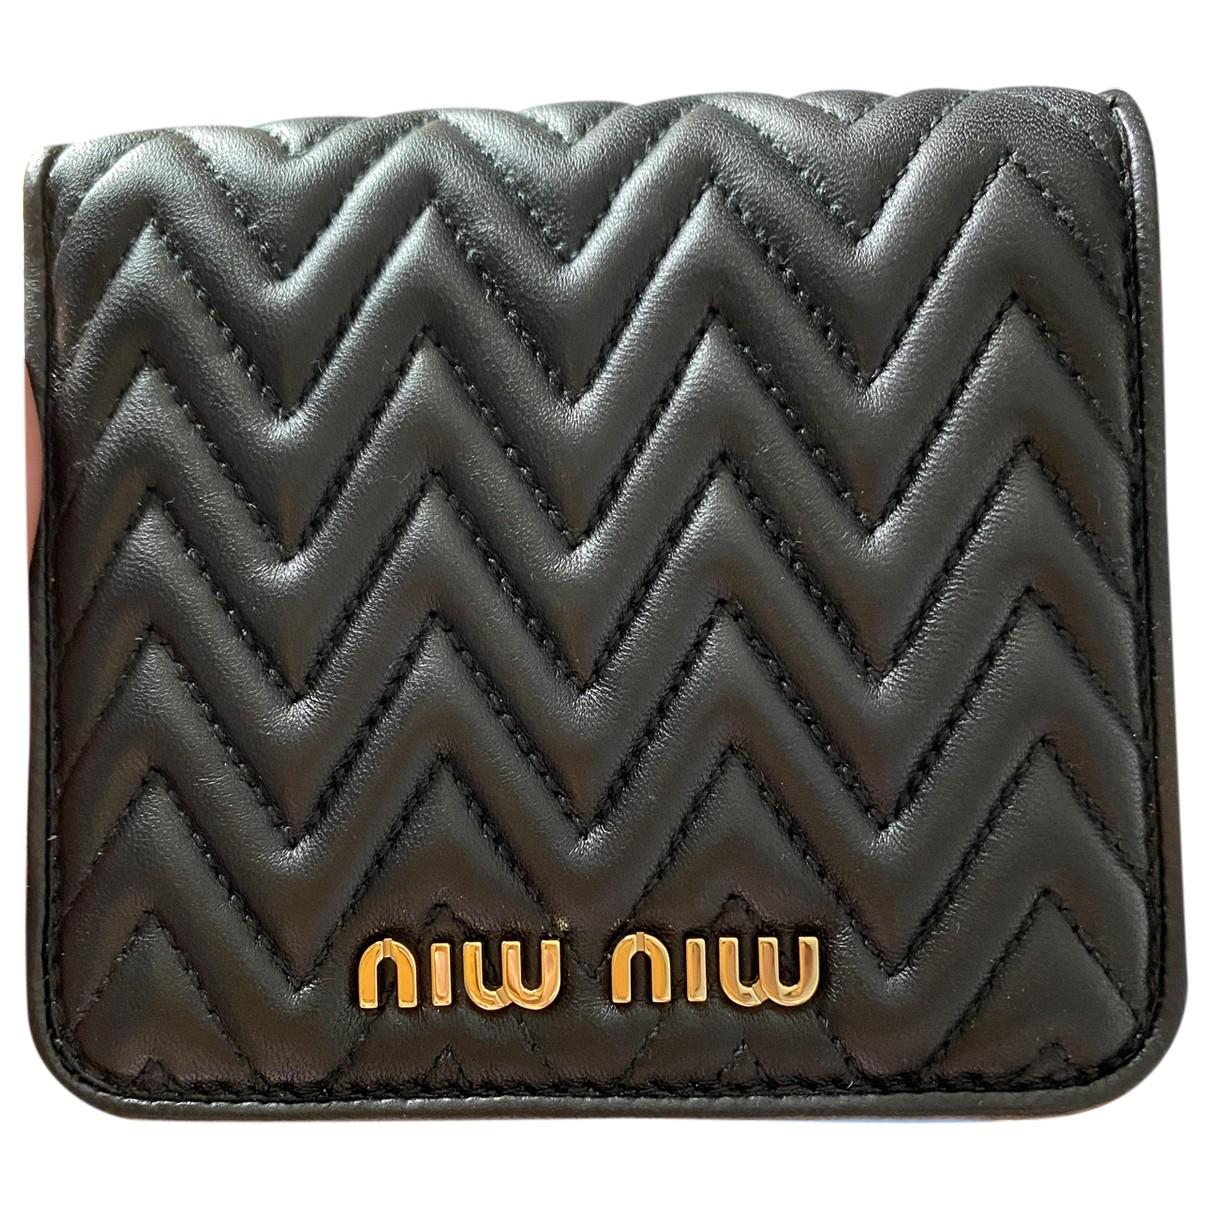 Miu Miu N Black Leather Purses, wallet & cases for Women N